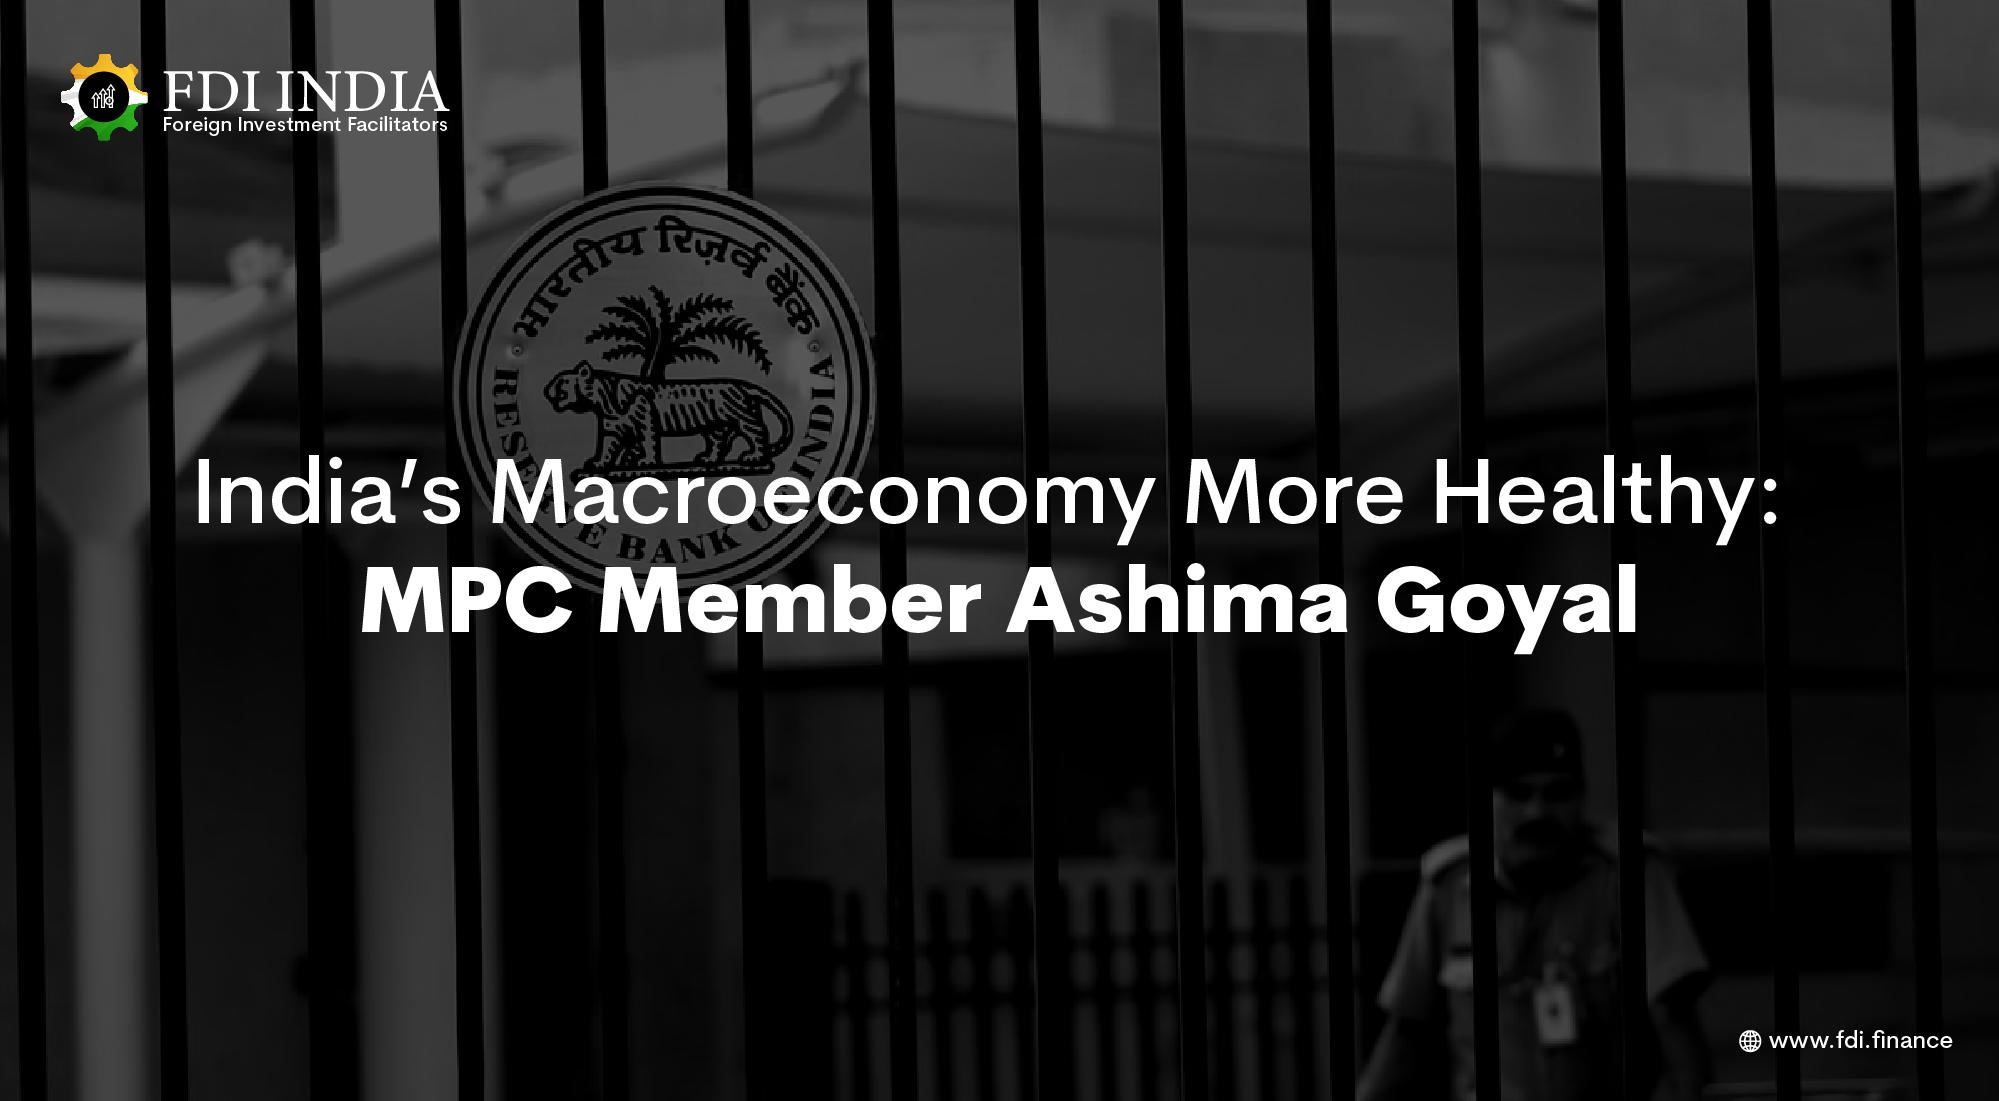 India's Macroeconomy More Healthy: MPC Member Ashima Goyal